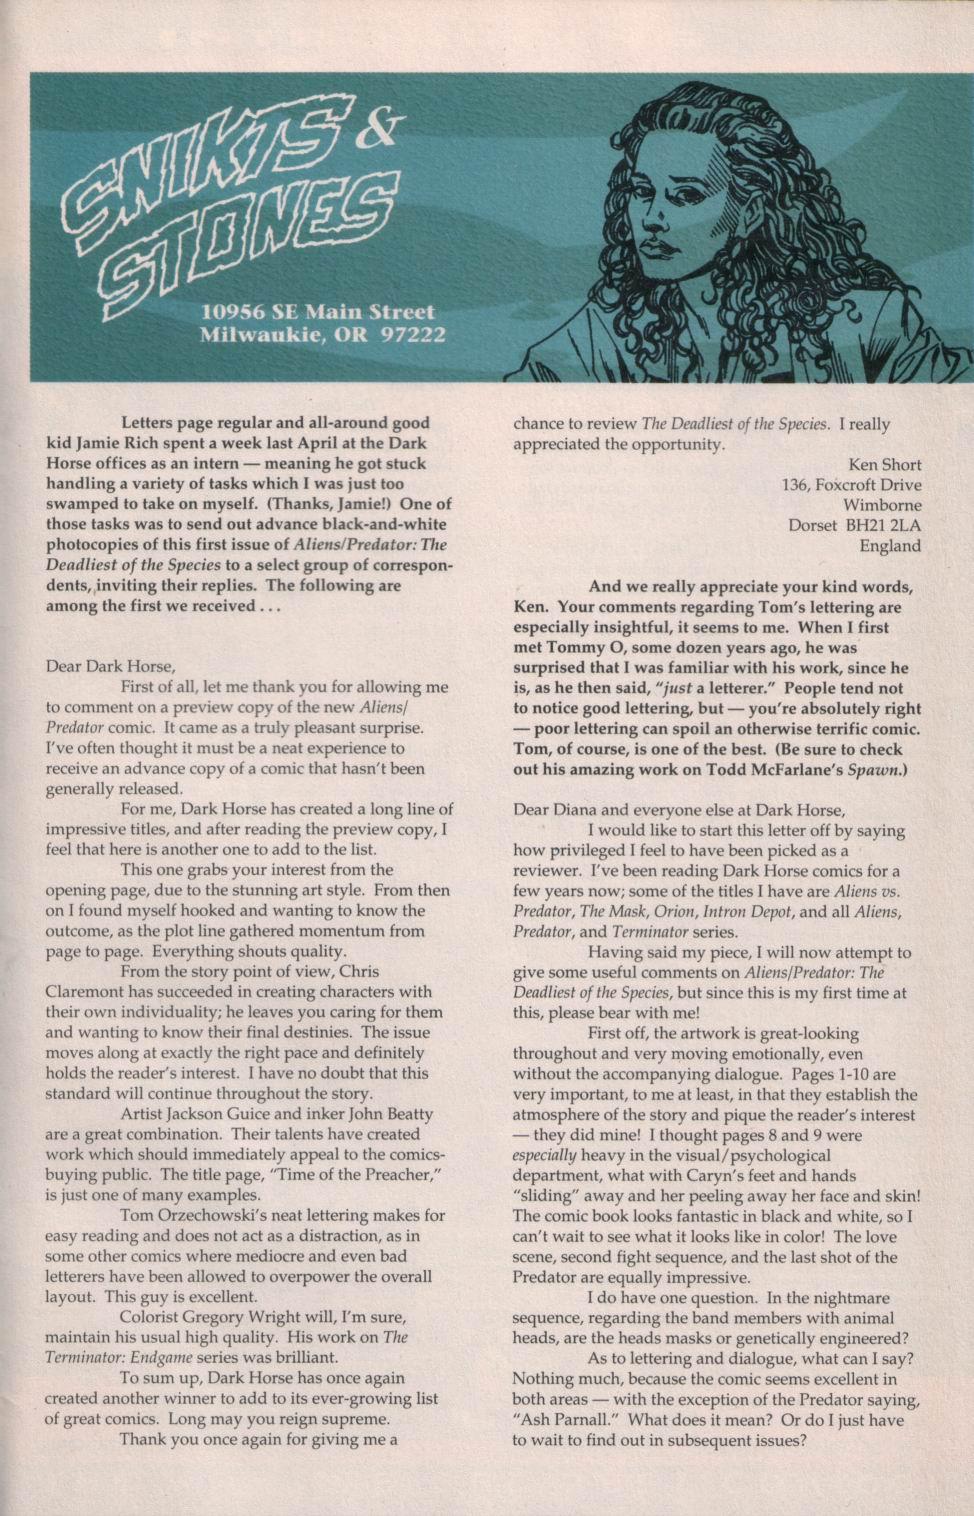 Read online Aliens/Predator: The Deadliest of the Species comic -  Issue #1 - 30